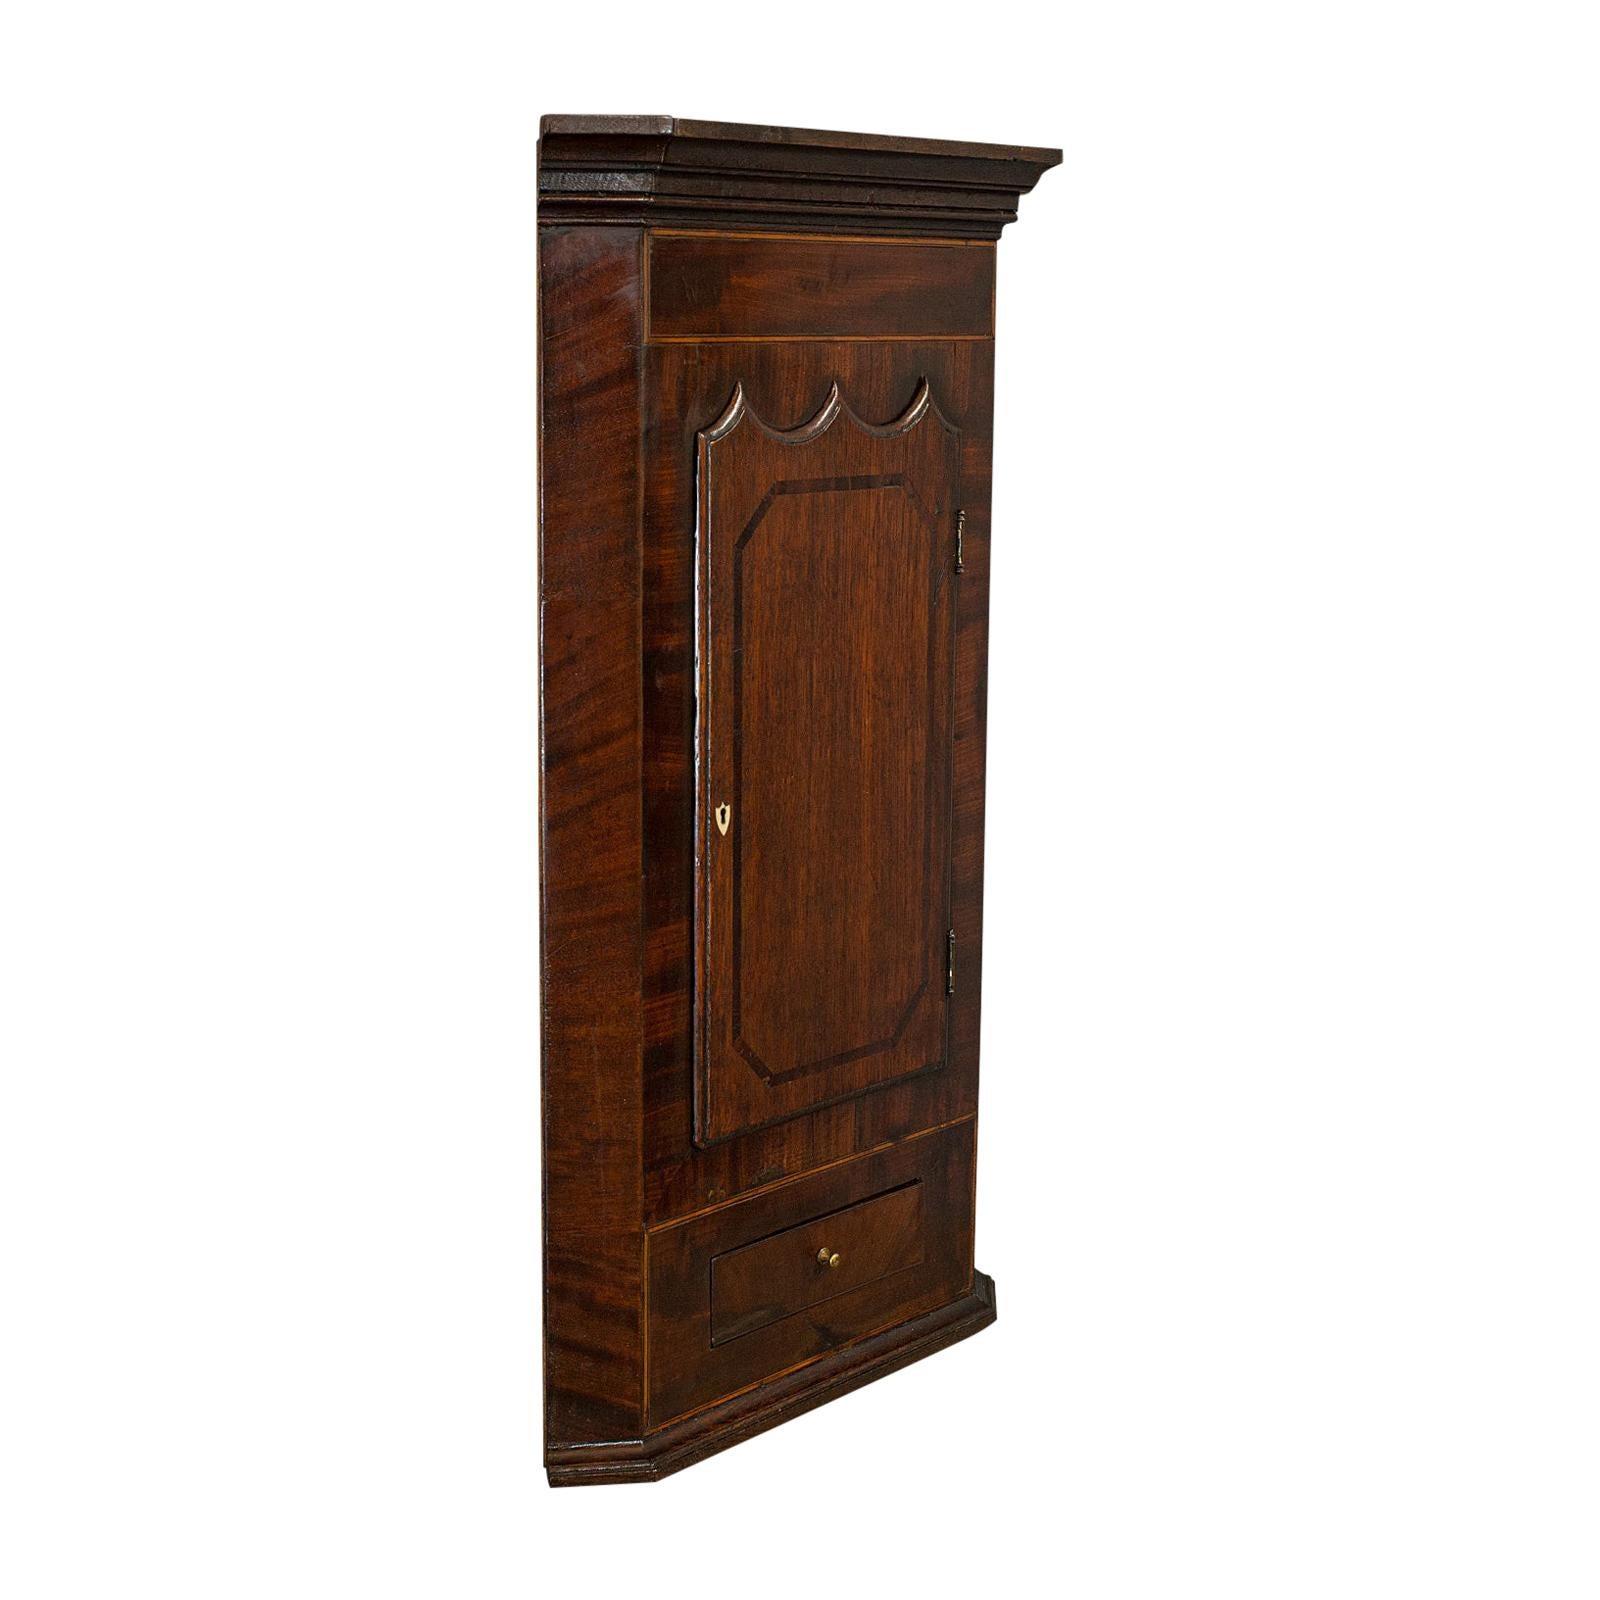 Corner Cabinet, English, Oak, Mahogany, Wall Hanging, Georgian, circa 1800